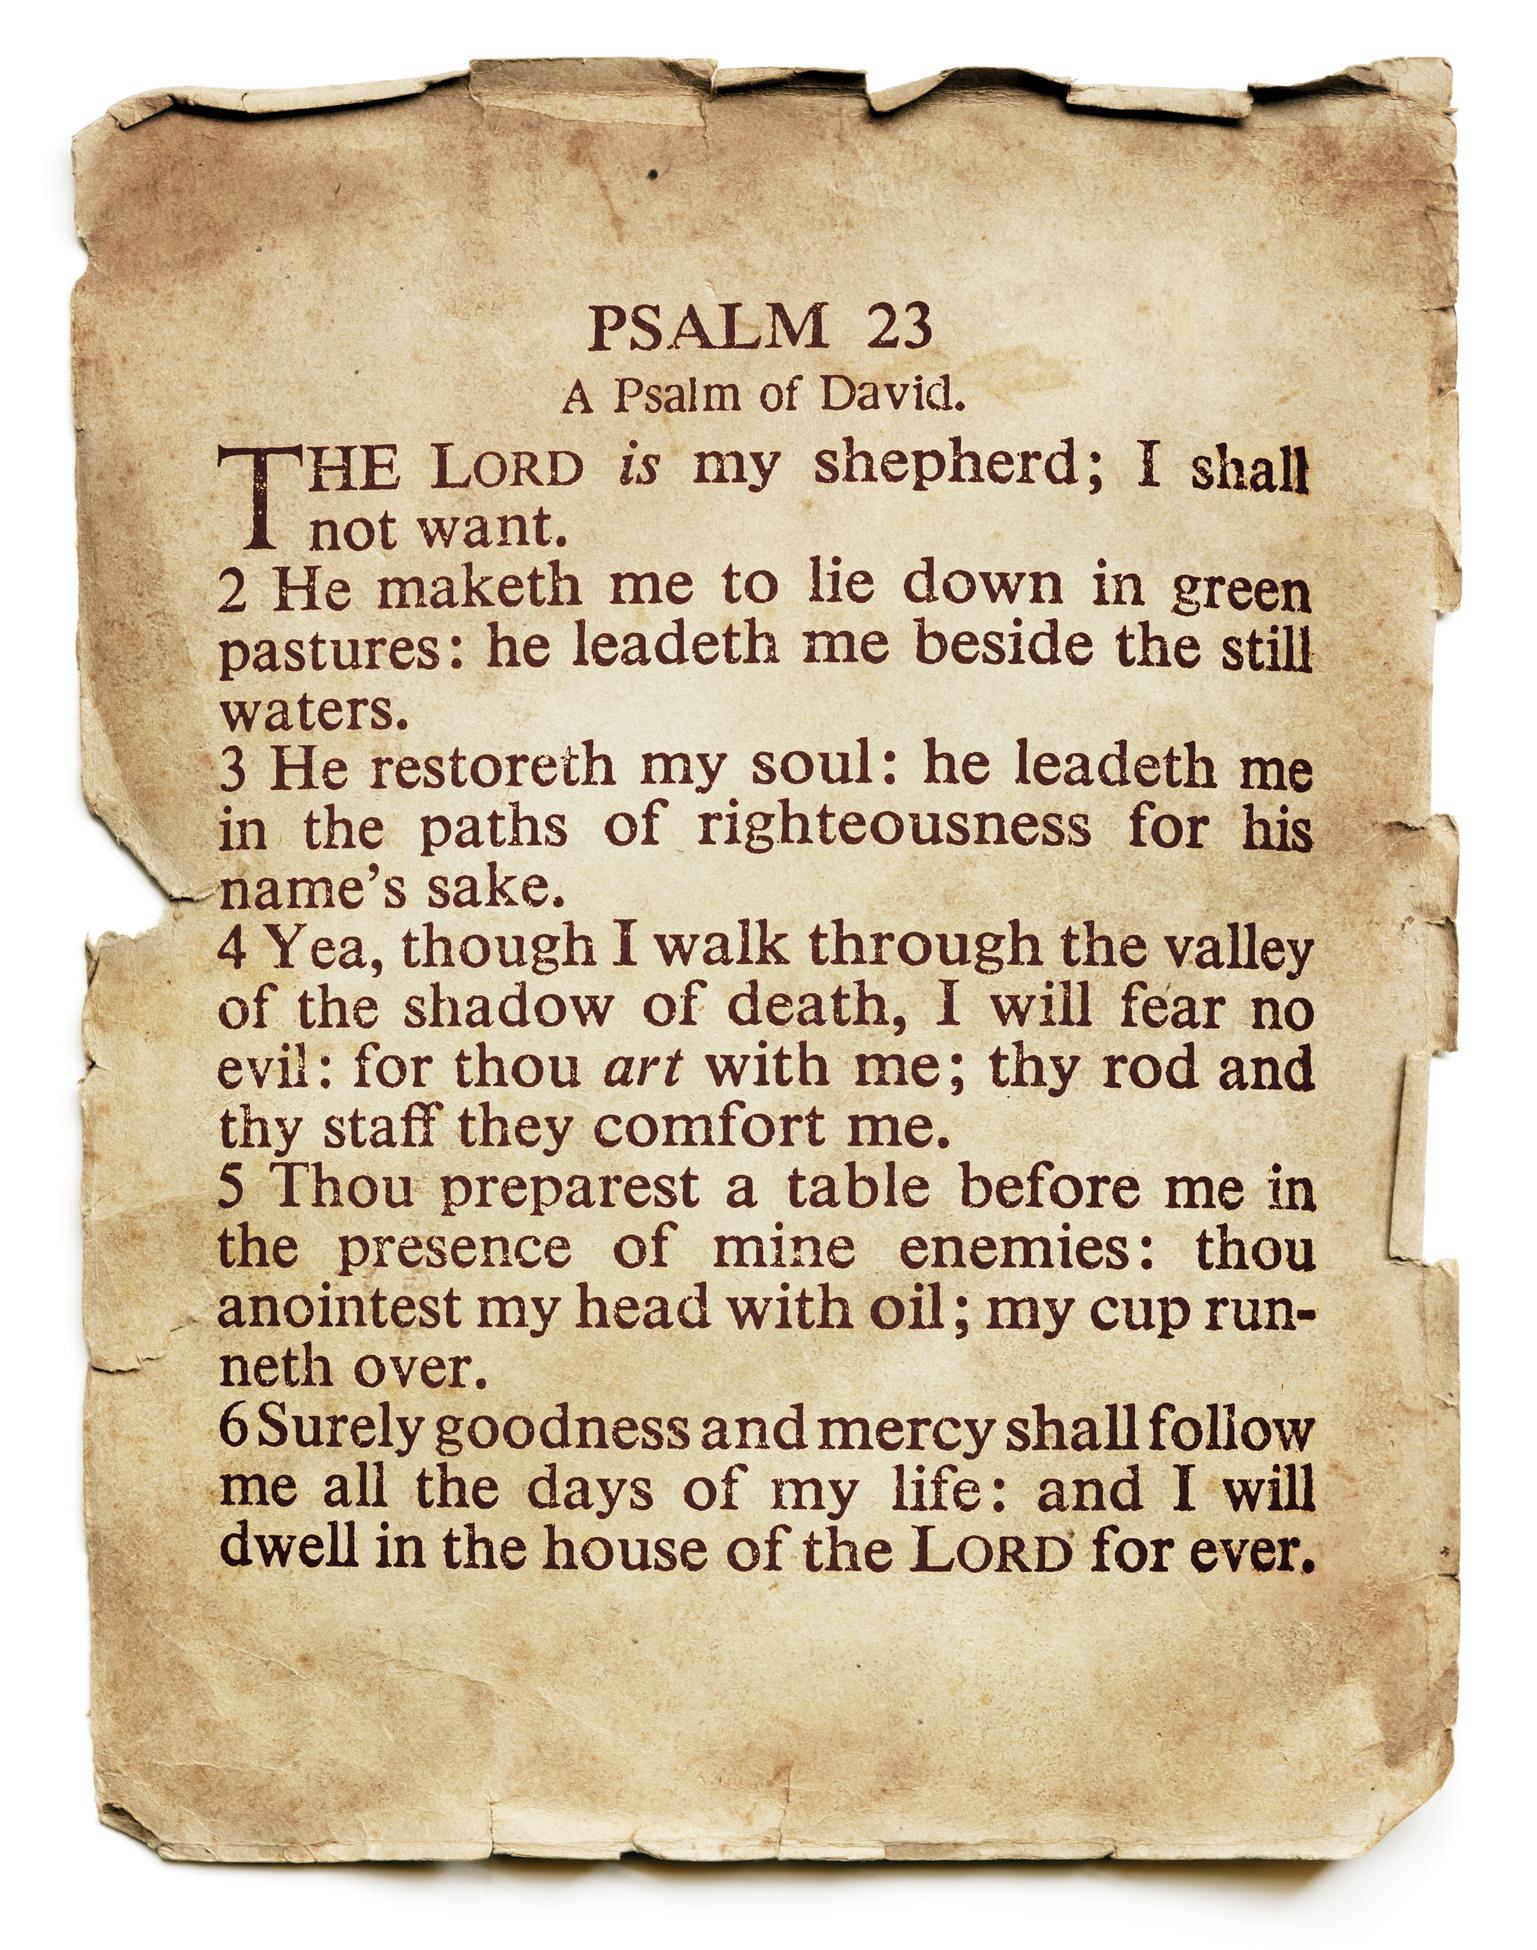 Psalm 23 In Pop Culture Universal Life Church